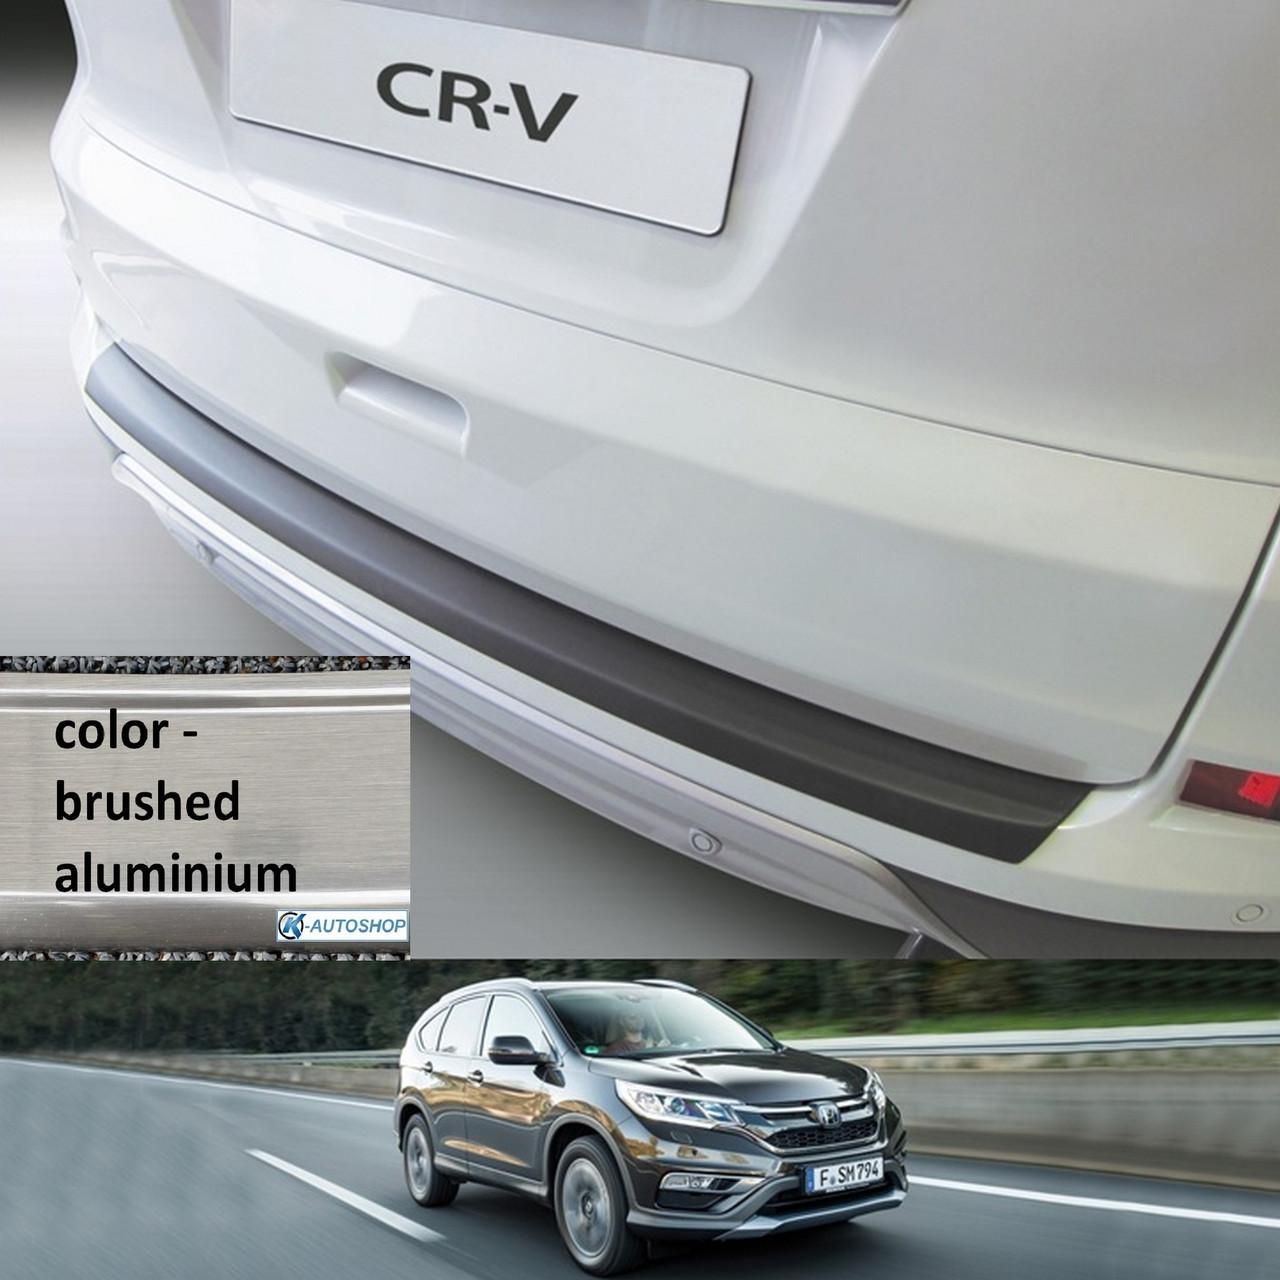 Пластикова захисна накладка на задній бампер для Honda CR-V Mk4 LIFT 2015-2018